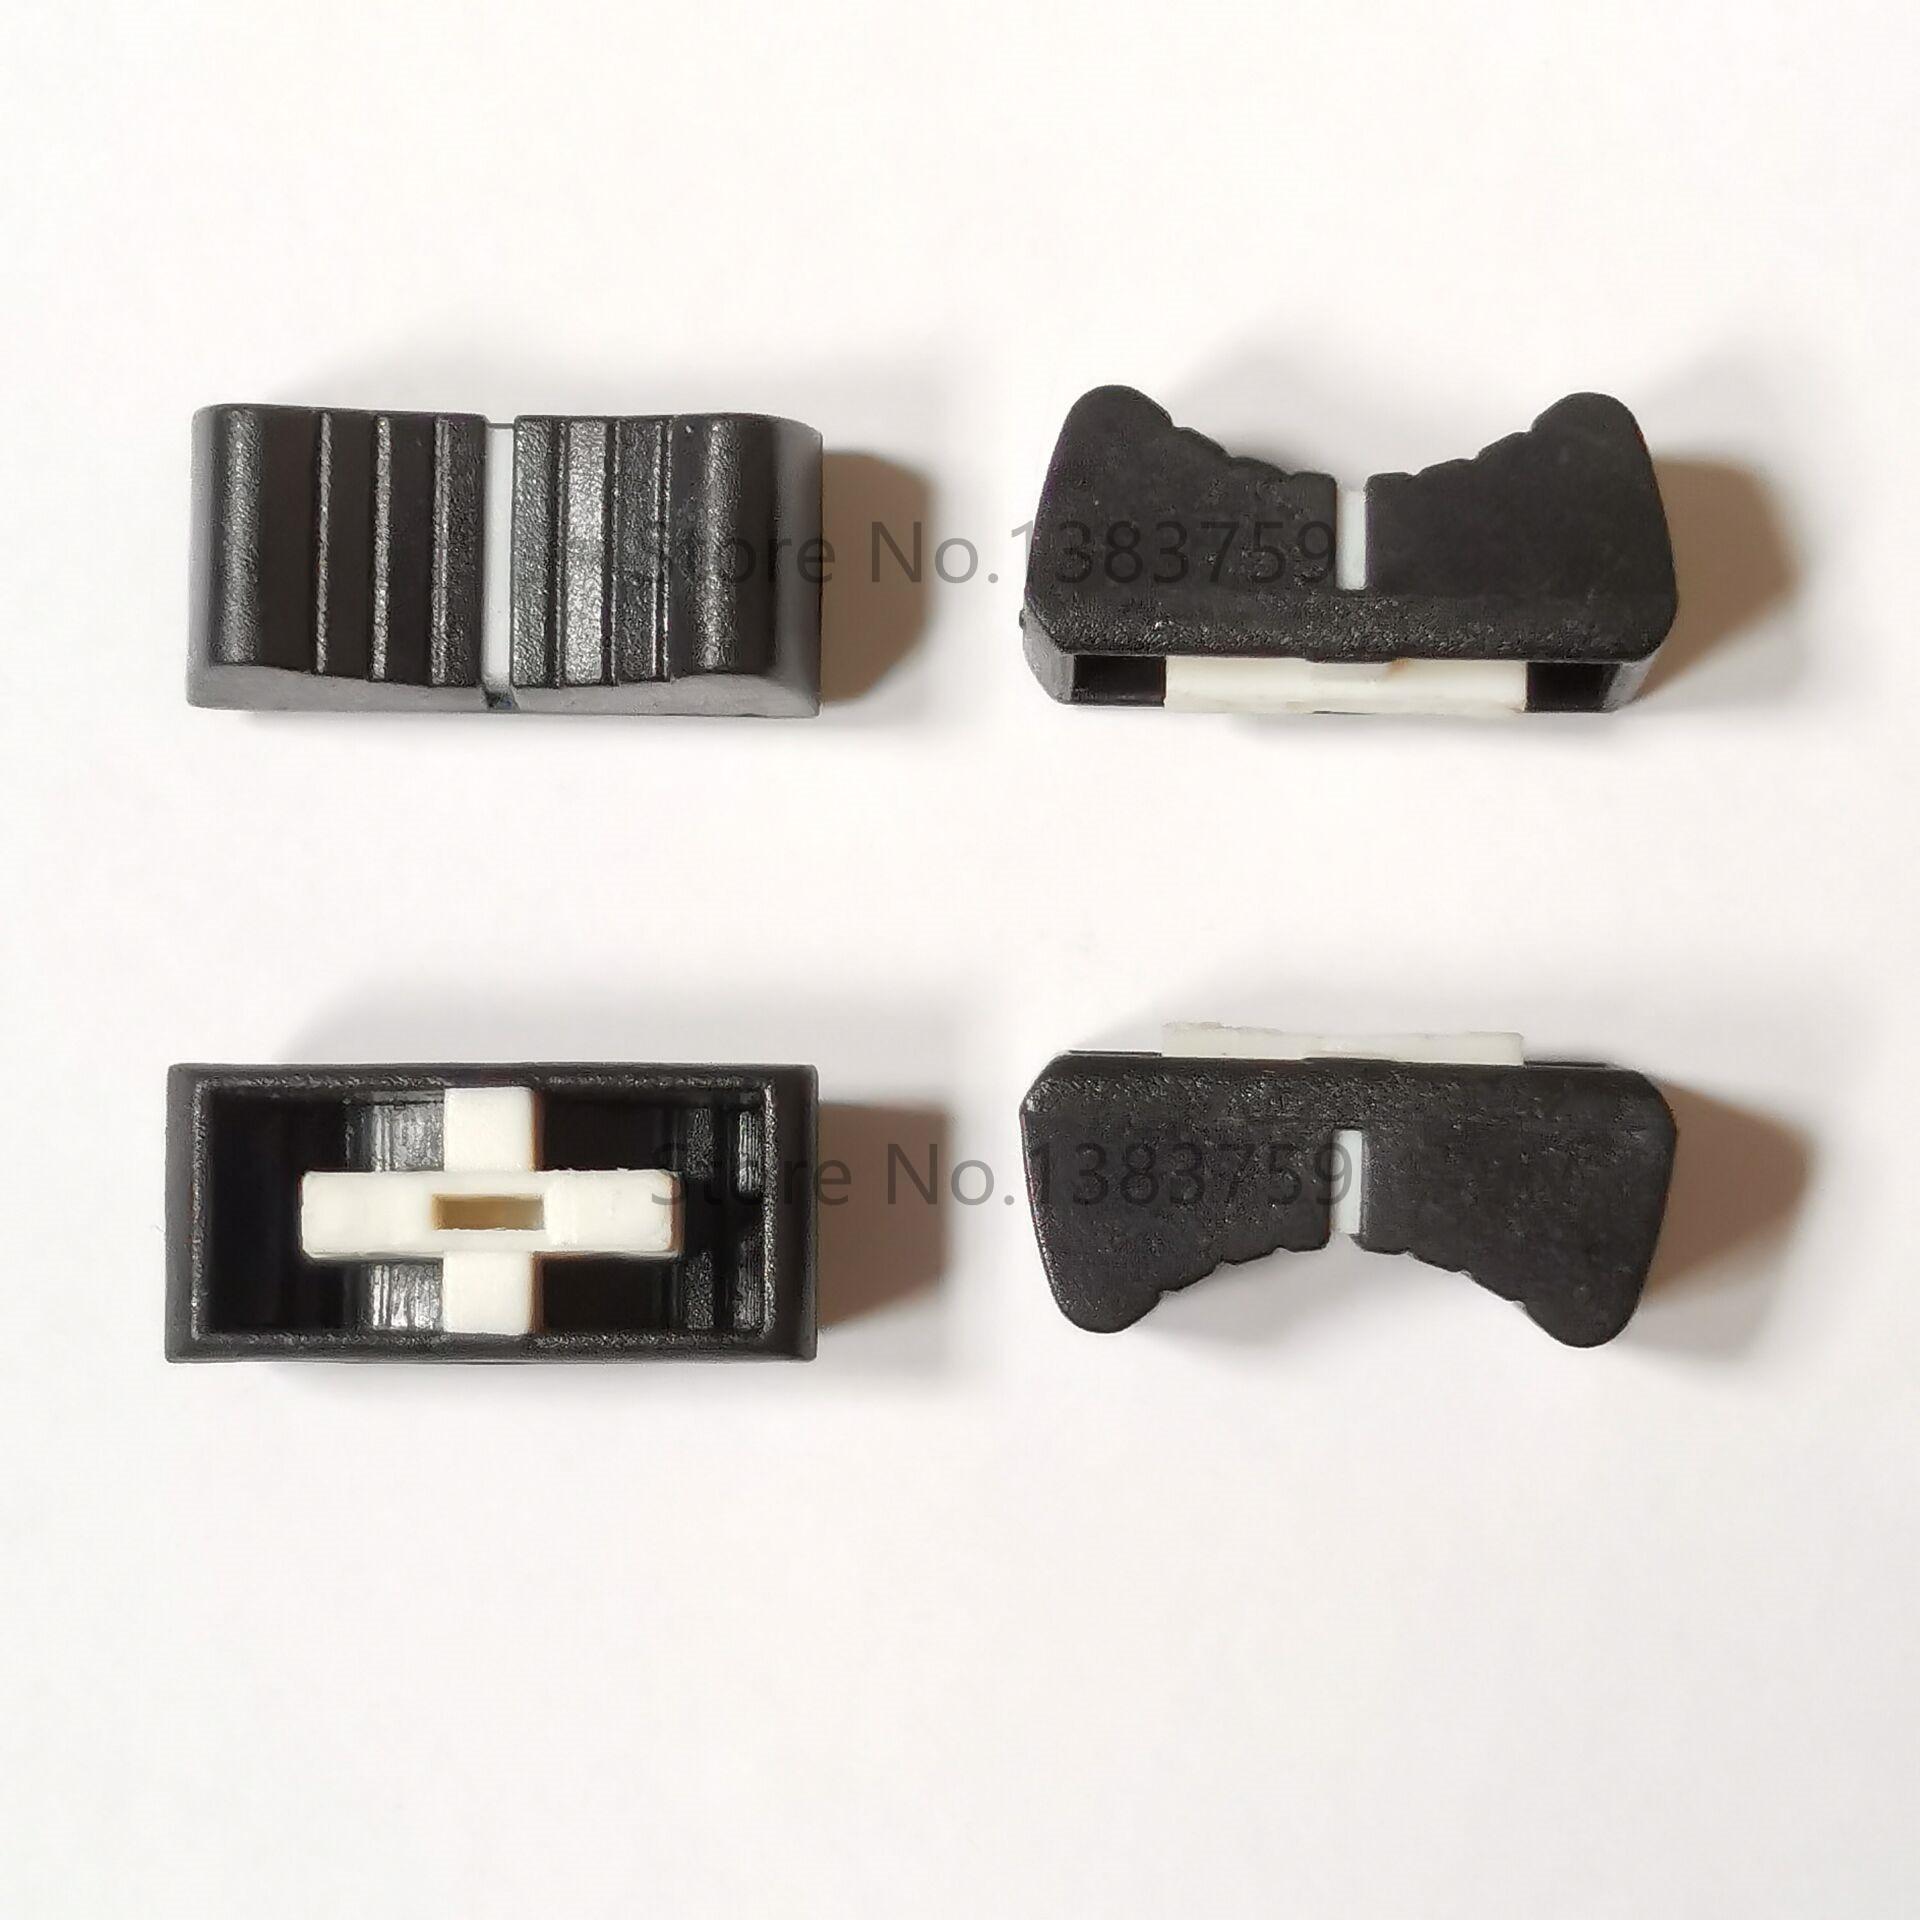 10pcs Misturador de slides potenciômetro chapéu combinando 24*11*11MM reta potenciômetro de slides fader cap haste tampa do furo interno 4*1.5MM